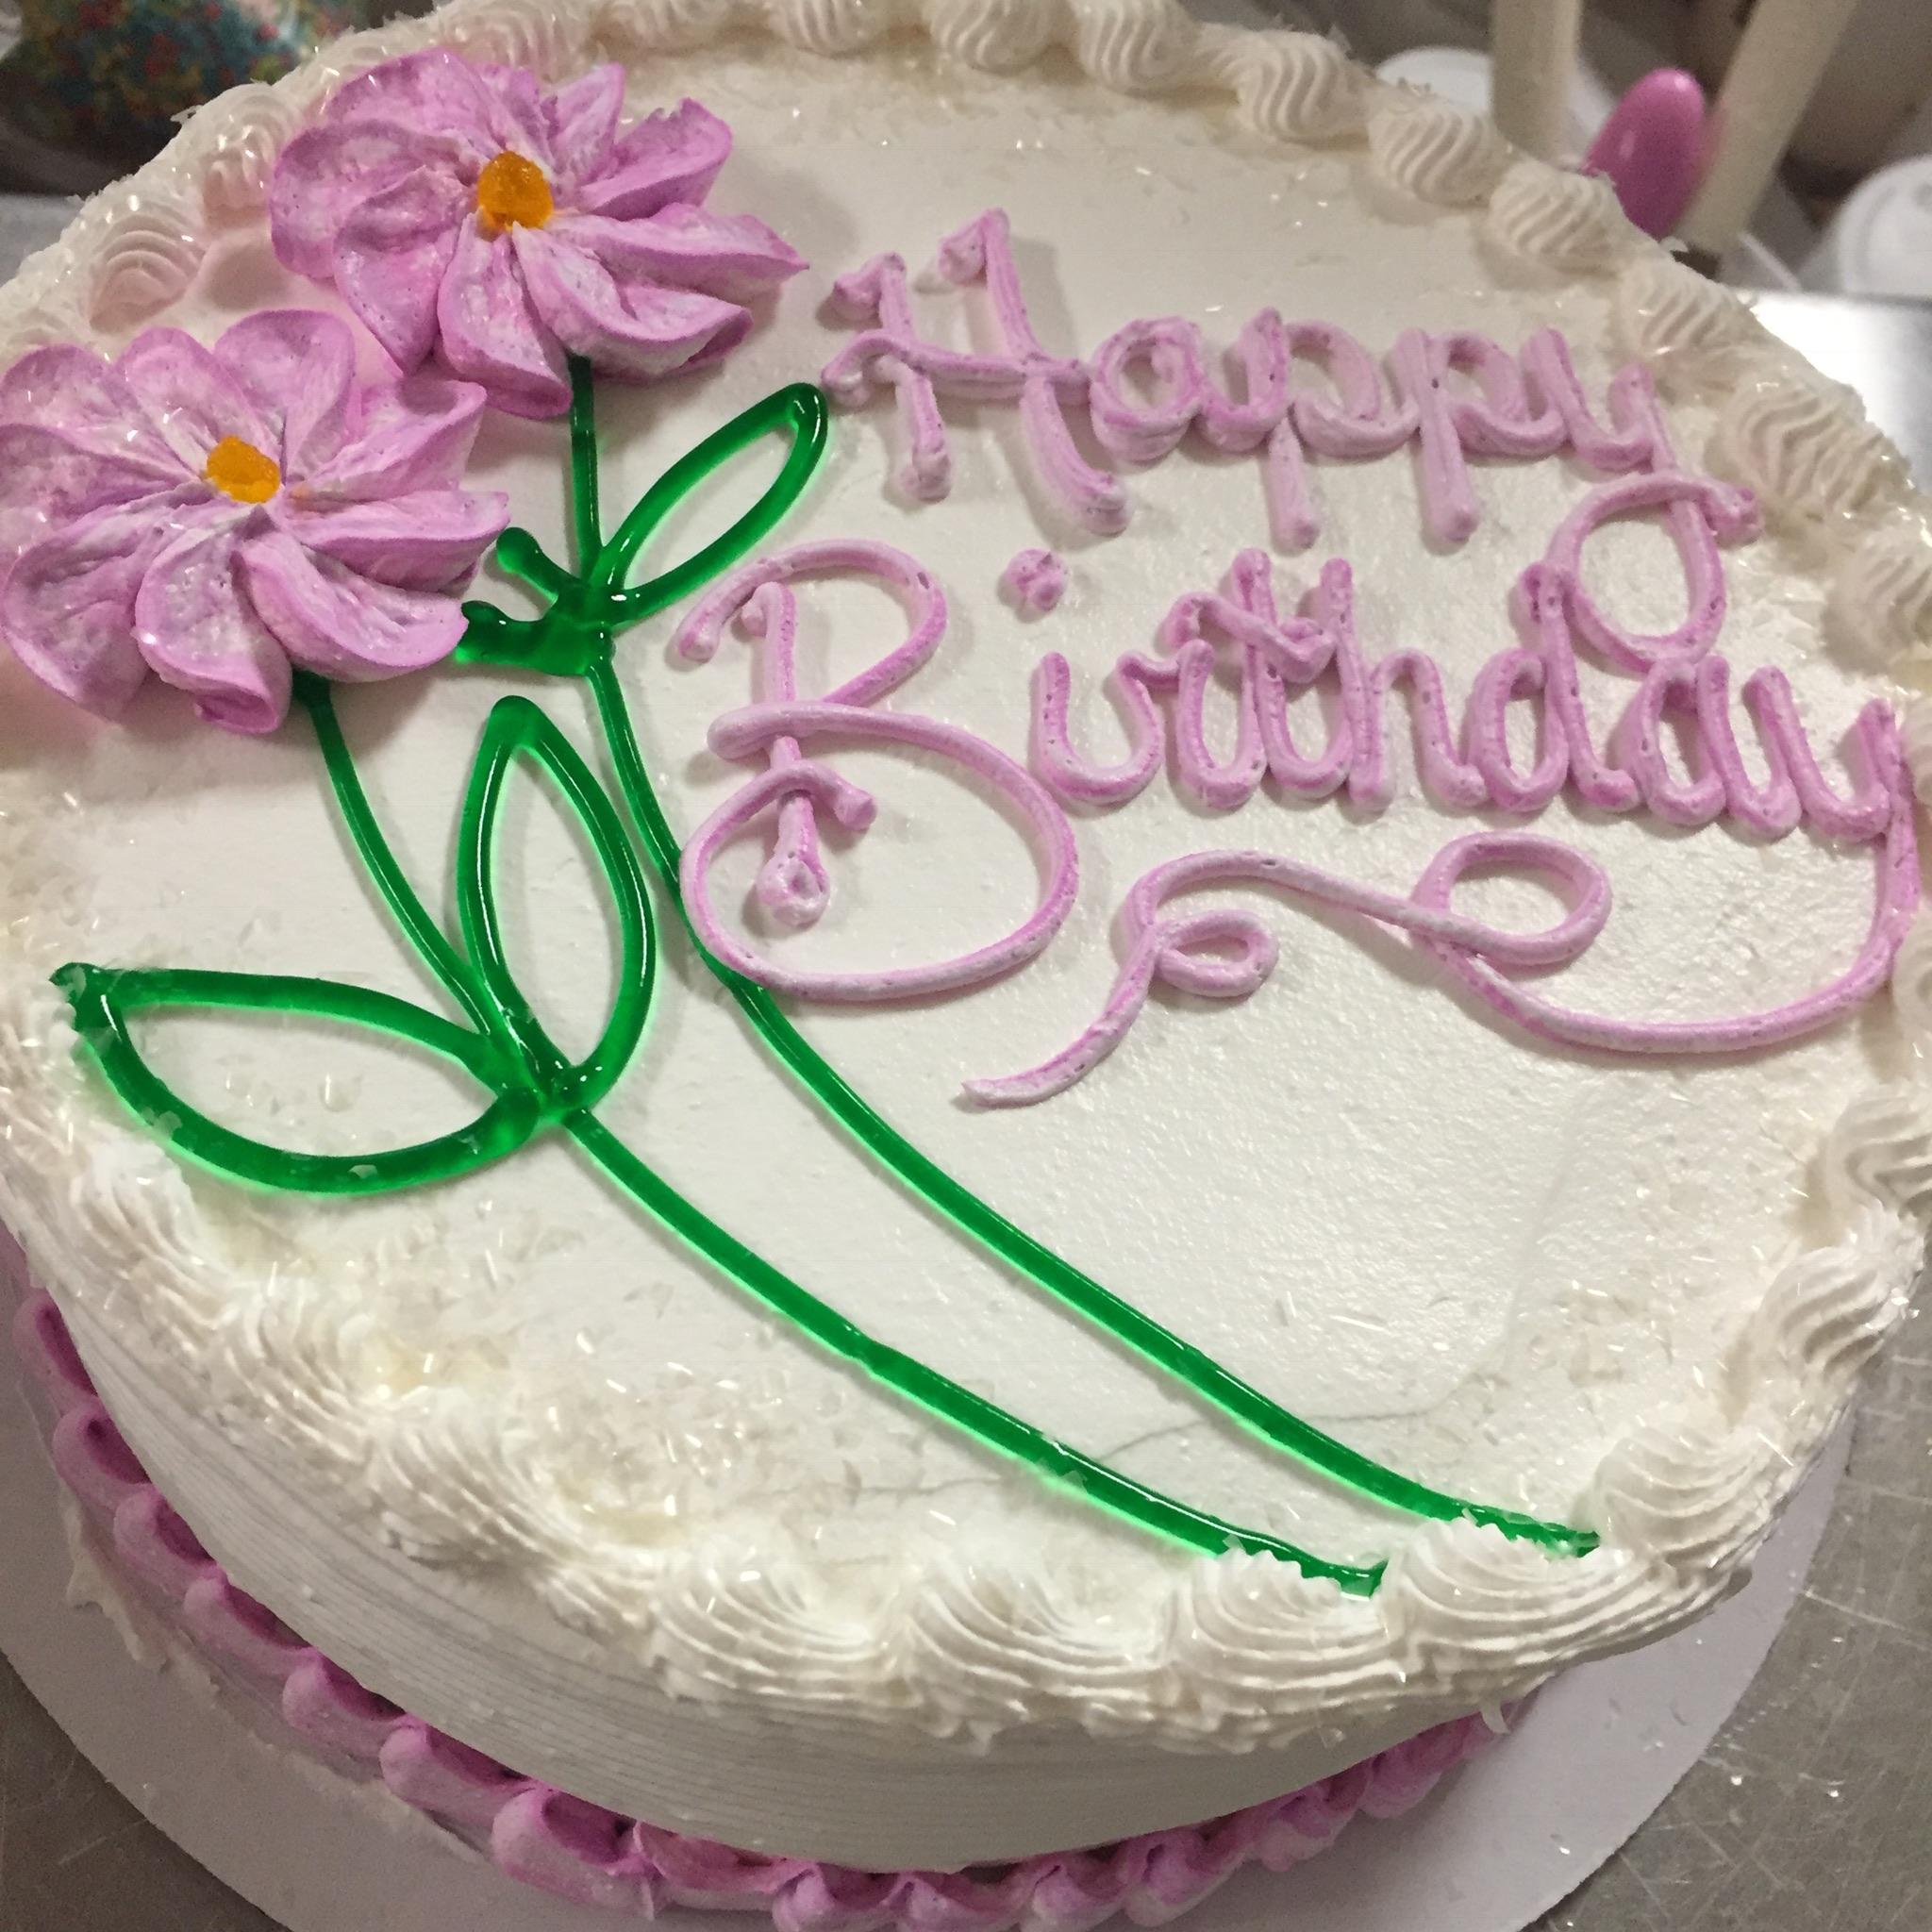 Cake Design #26